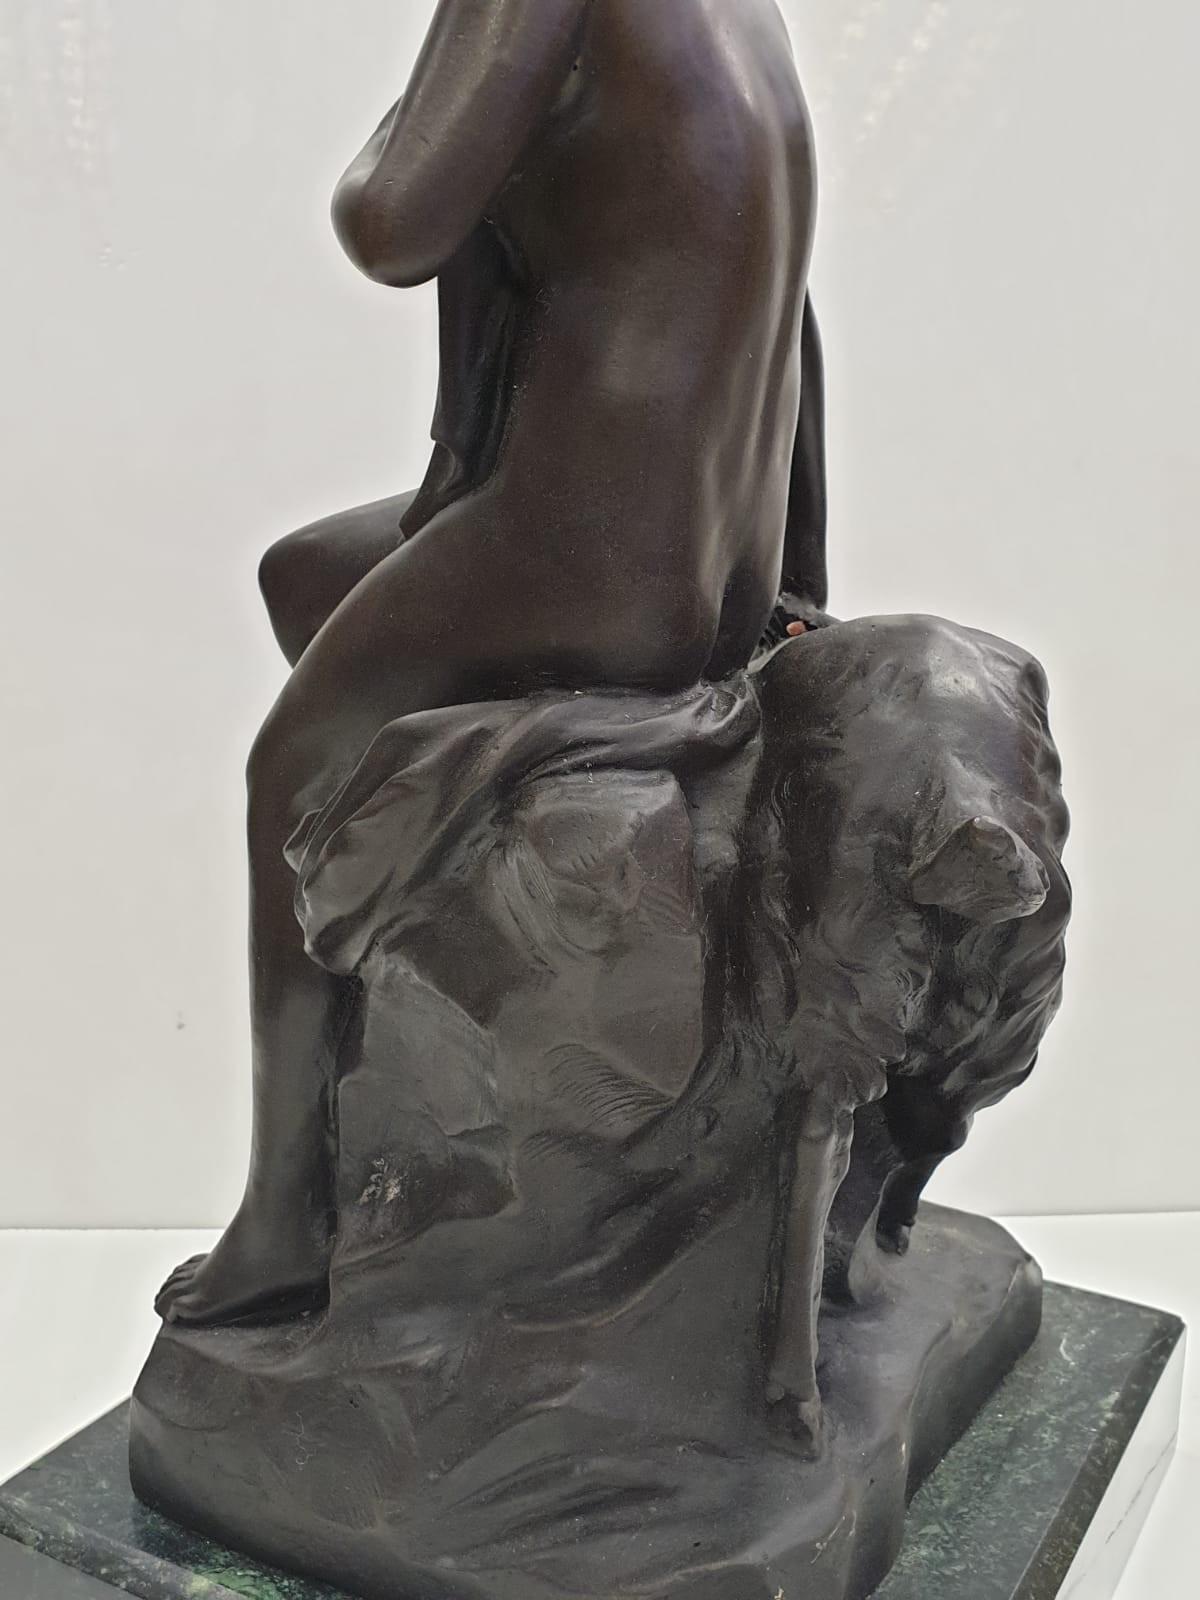 Bronze Pierre Julien figurine on plinth. 'Amalthea and Jupiter's Goat'. Height 45cm. Weight 9.7kg - Image 18 of 27